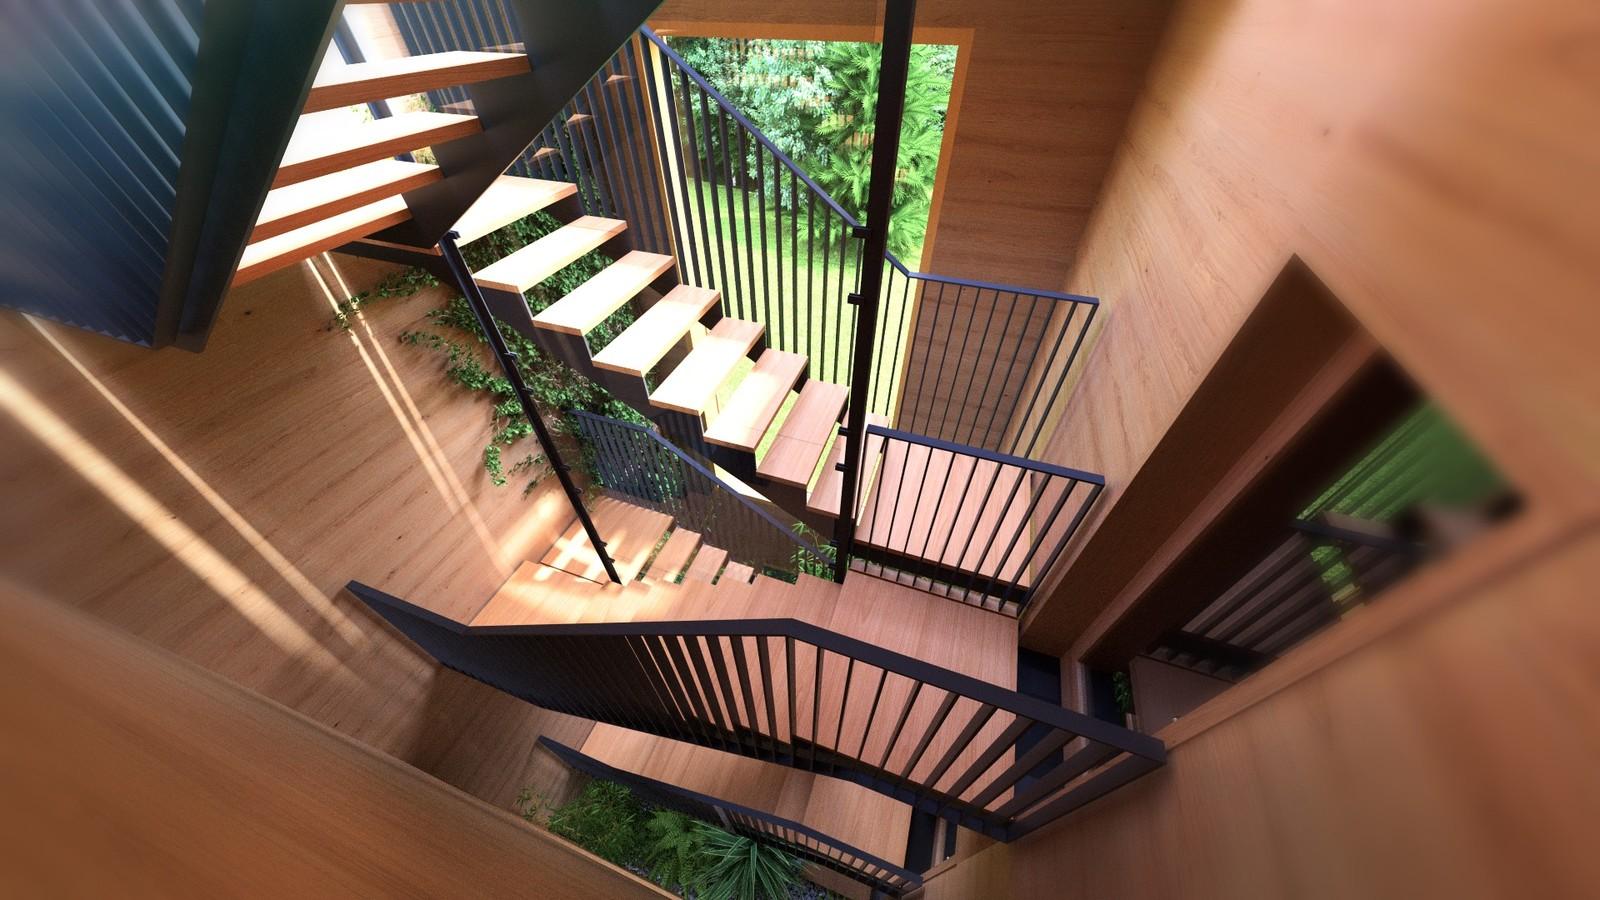 28B A1309-Villas Portier 3d STAIRCASE-GARAGE-Staircase 2nd floor 01G  KP webpage of project: http://www.kemppro.com/KP_3D_communication_3_Villas_Veyrier.html